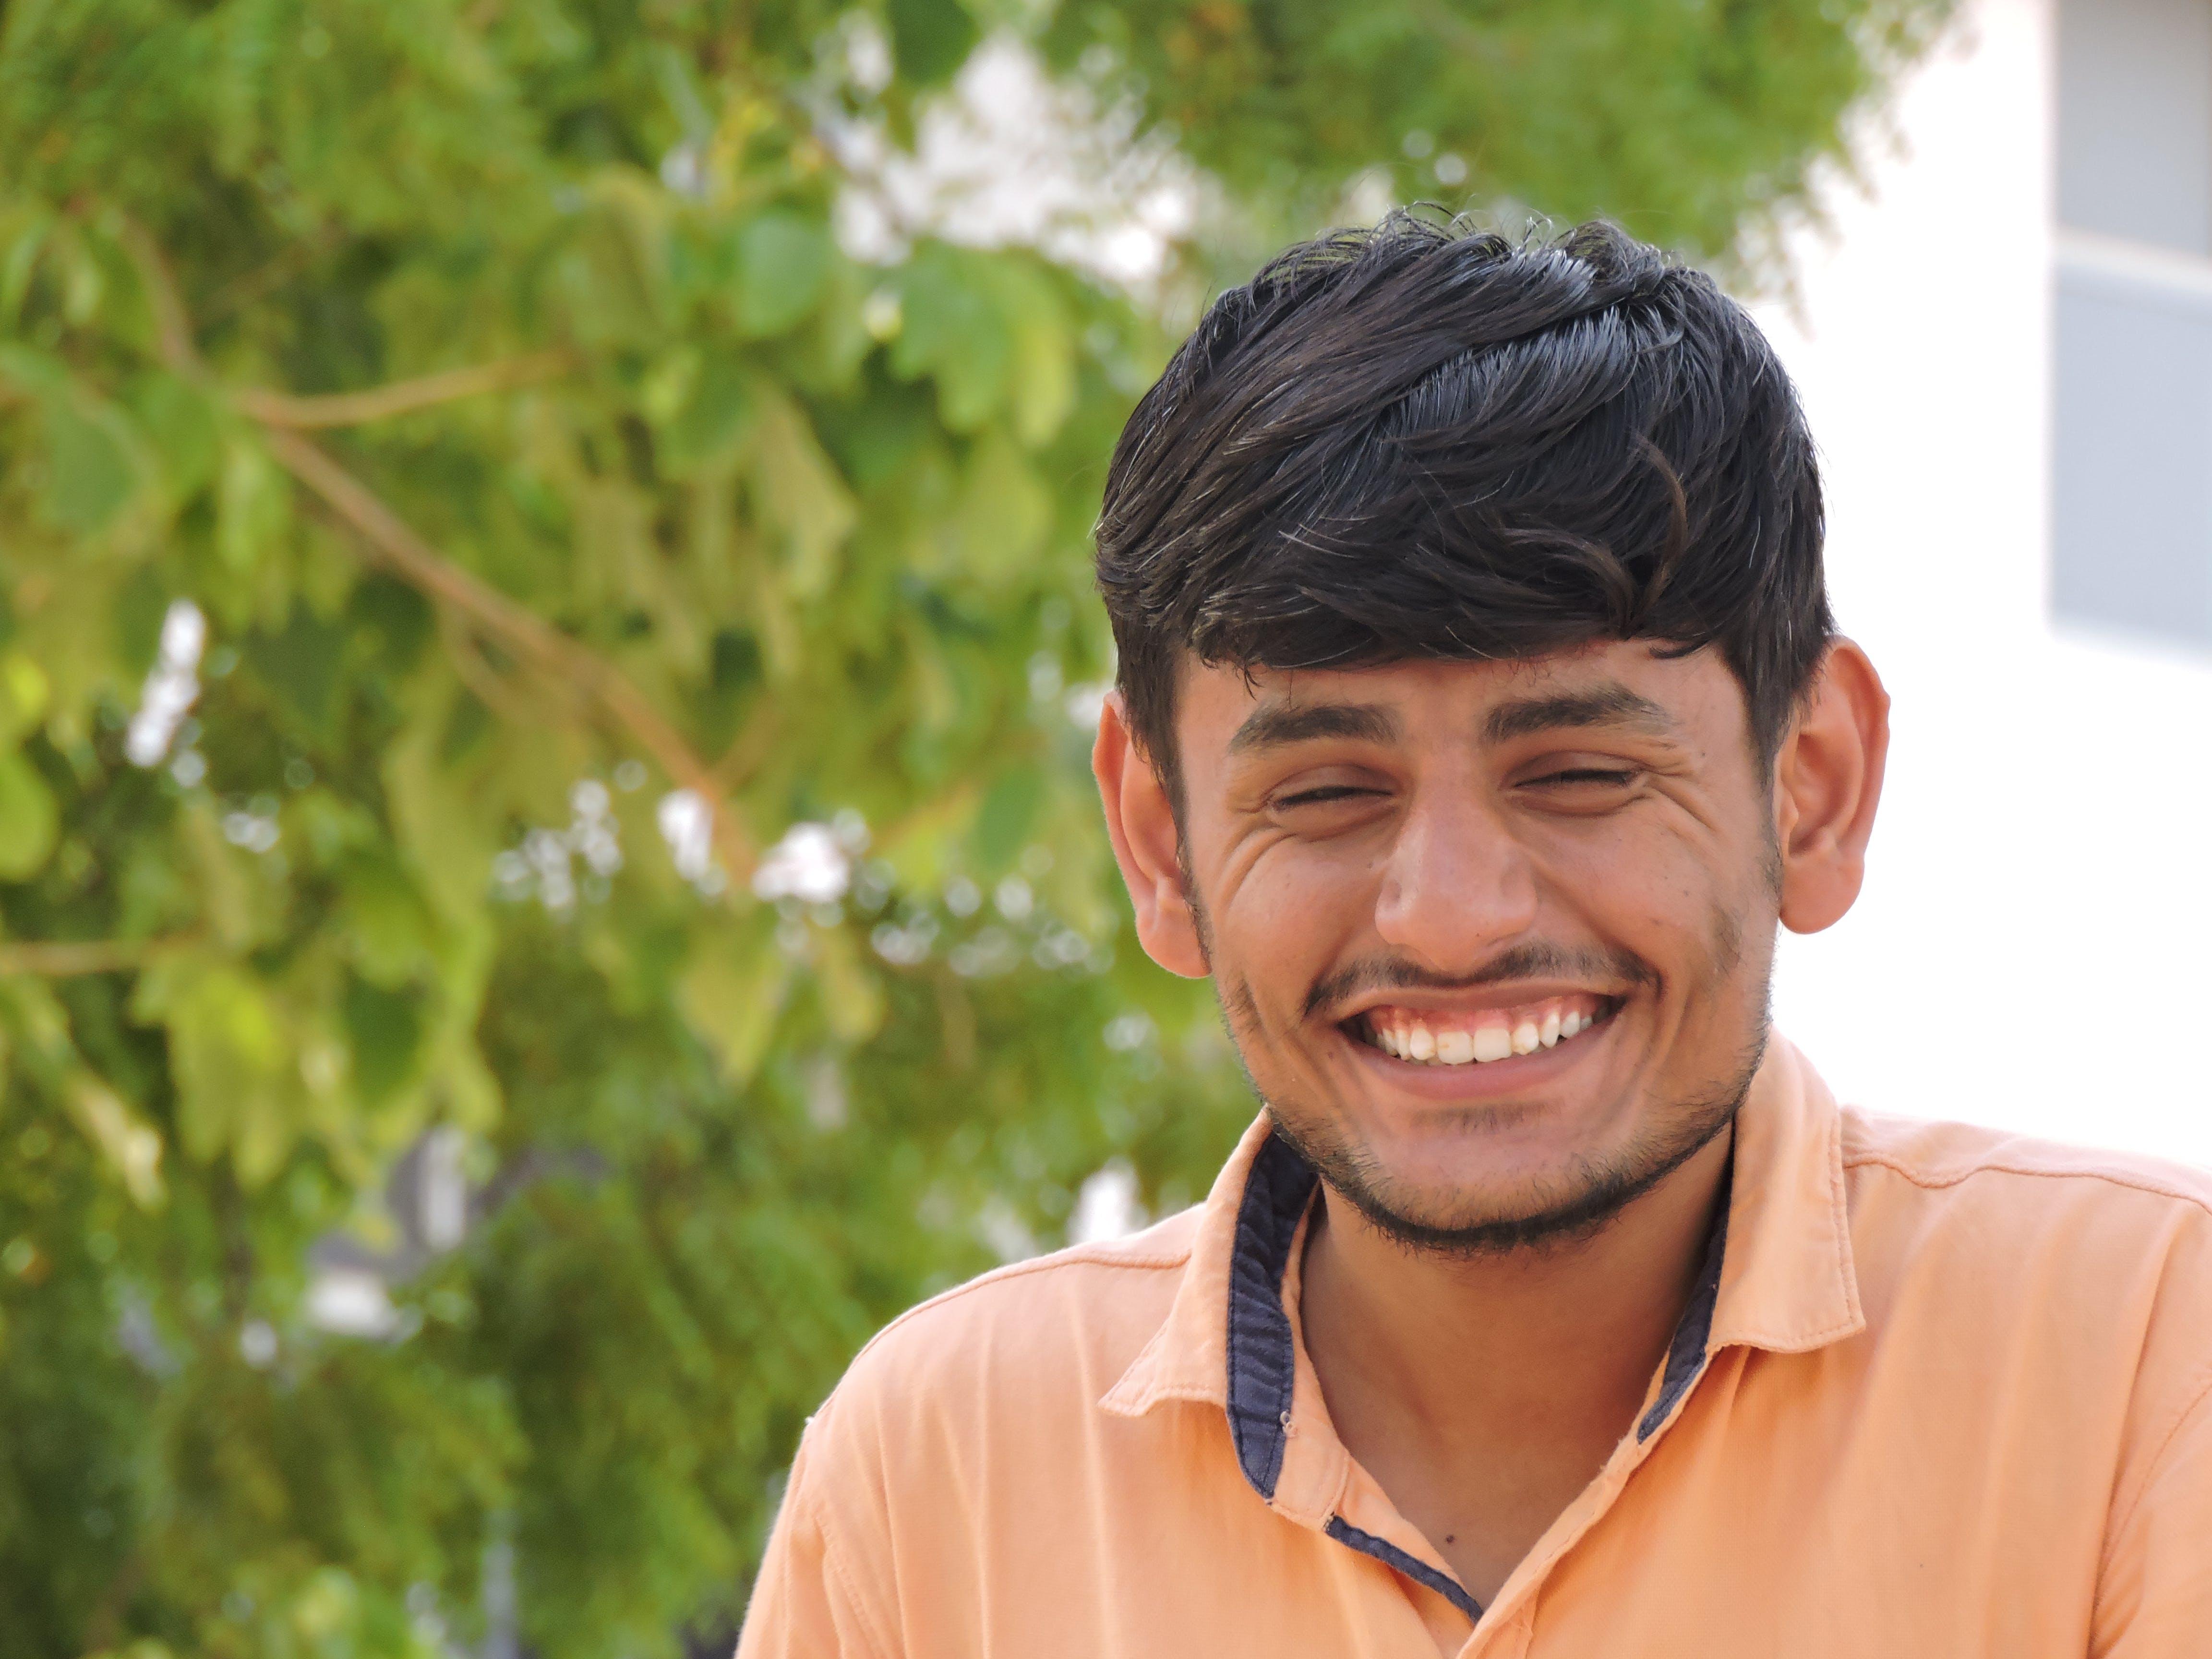 Man Smiles While Taking Photo Near Tall Tree at Daytime